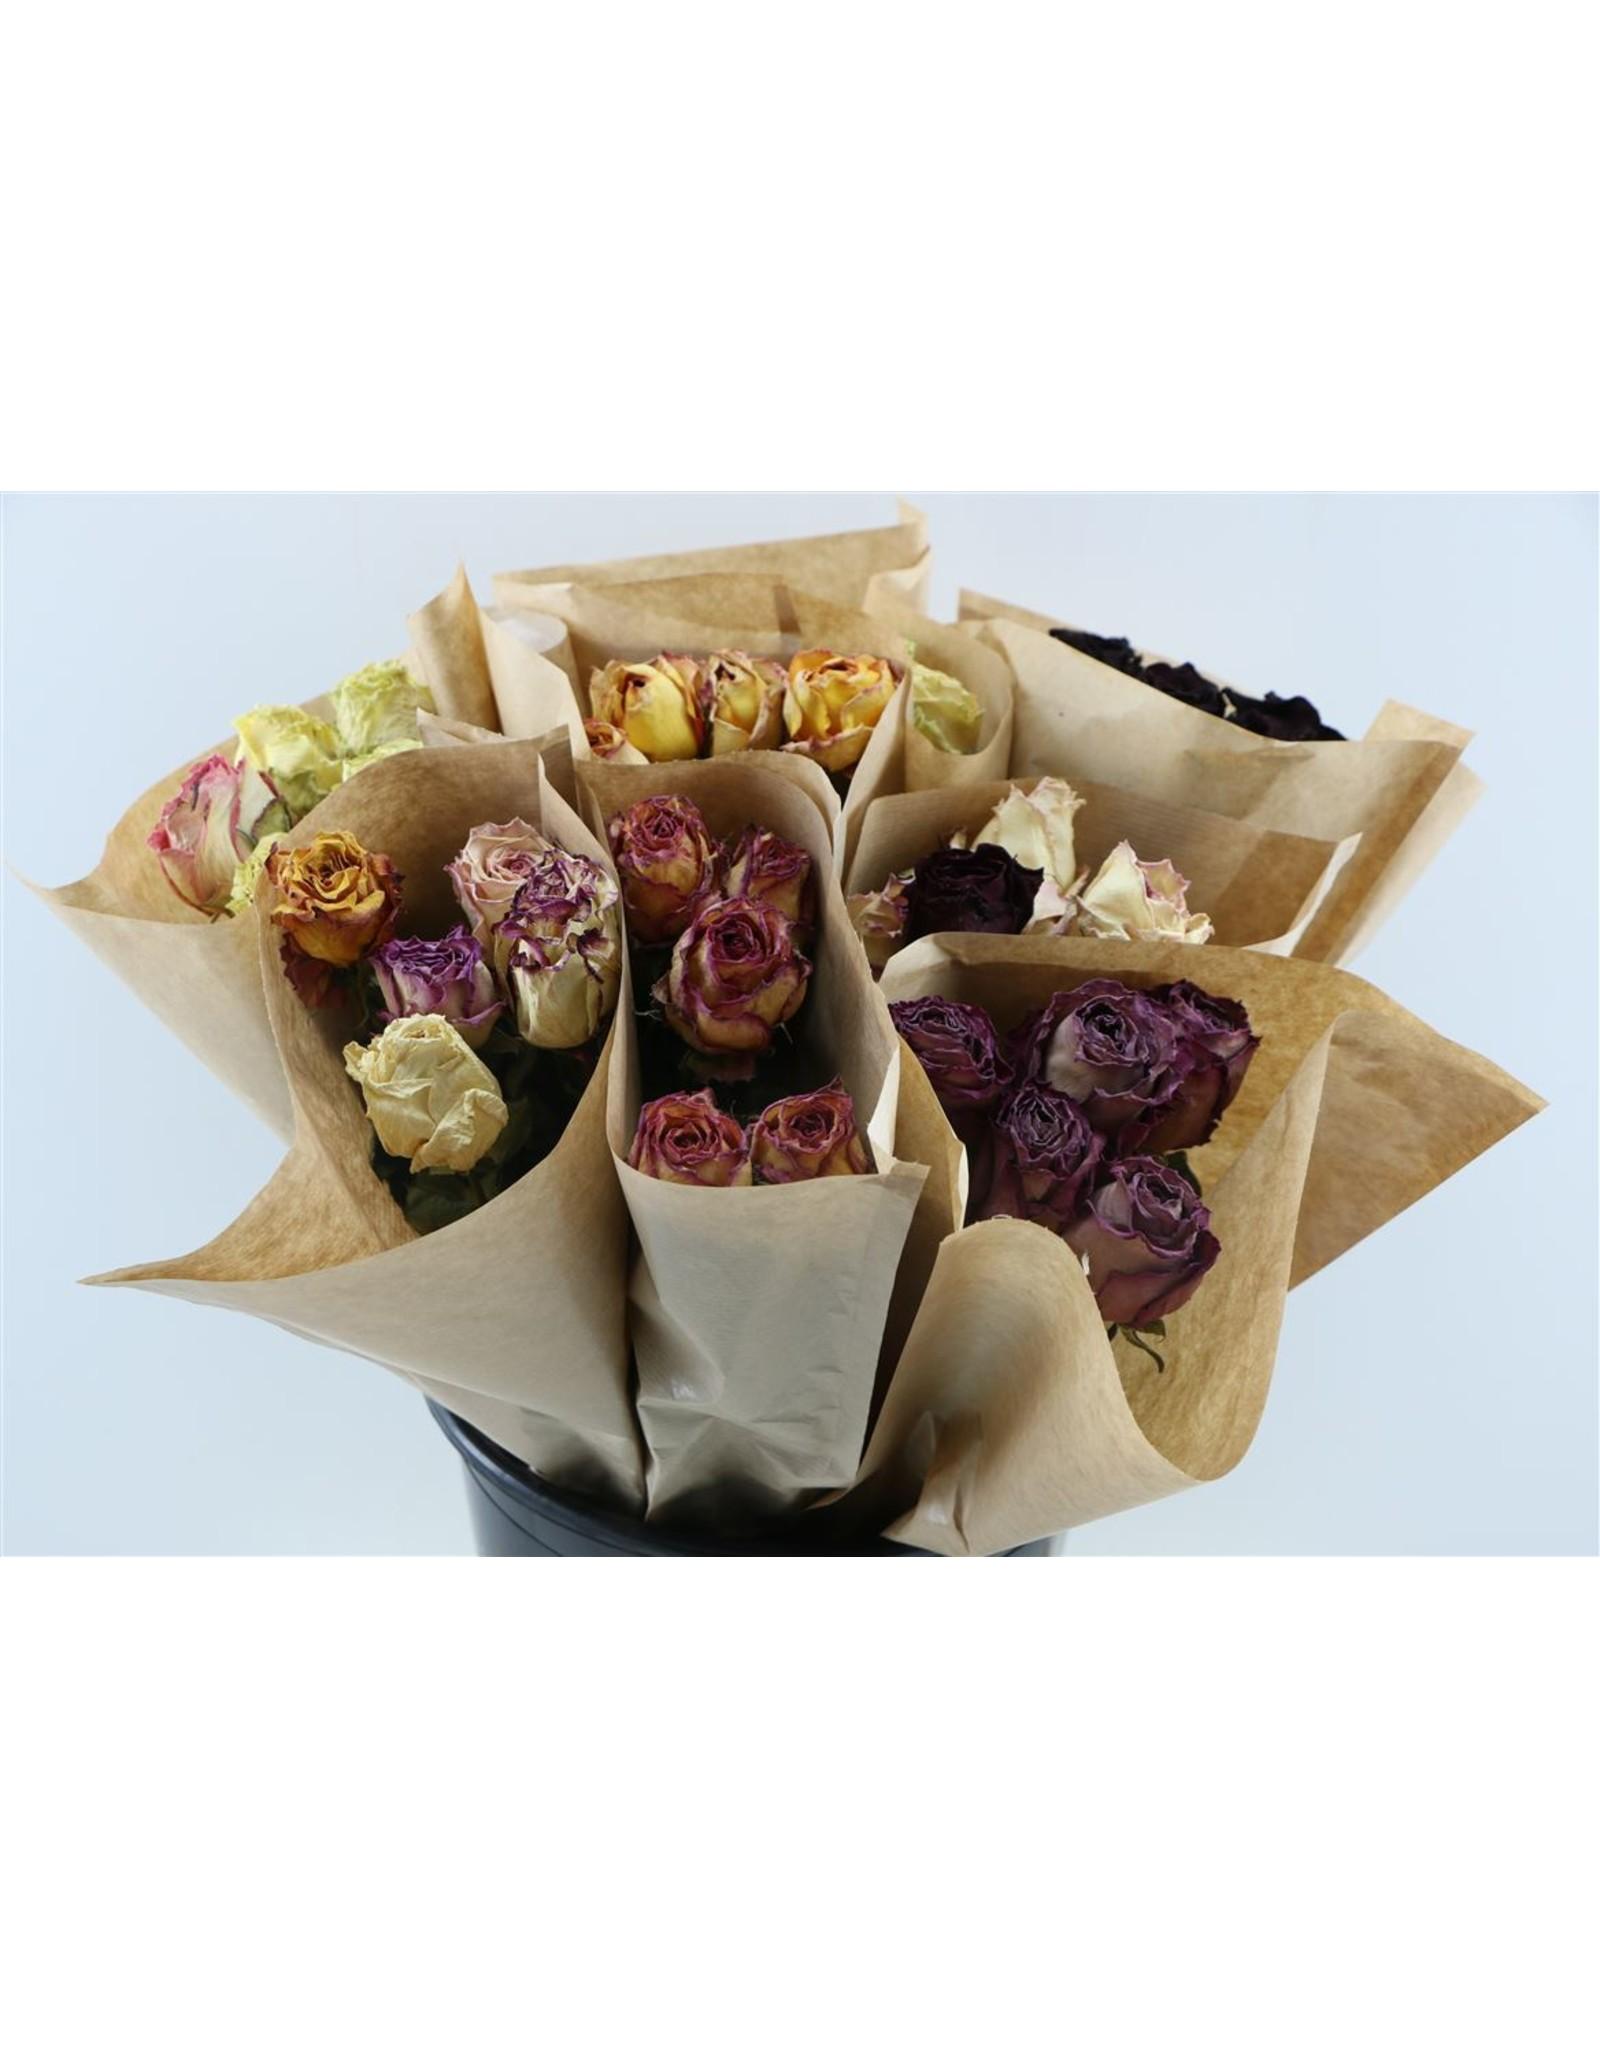 Dried Roses From Ecuador 5pcs 50cm Bunch x 20